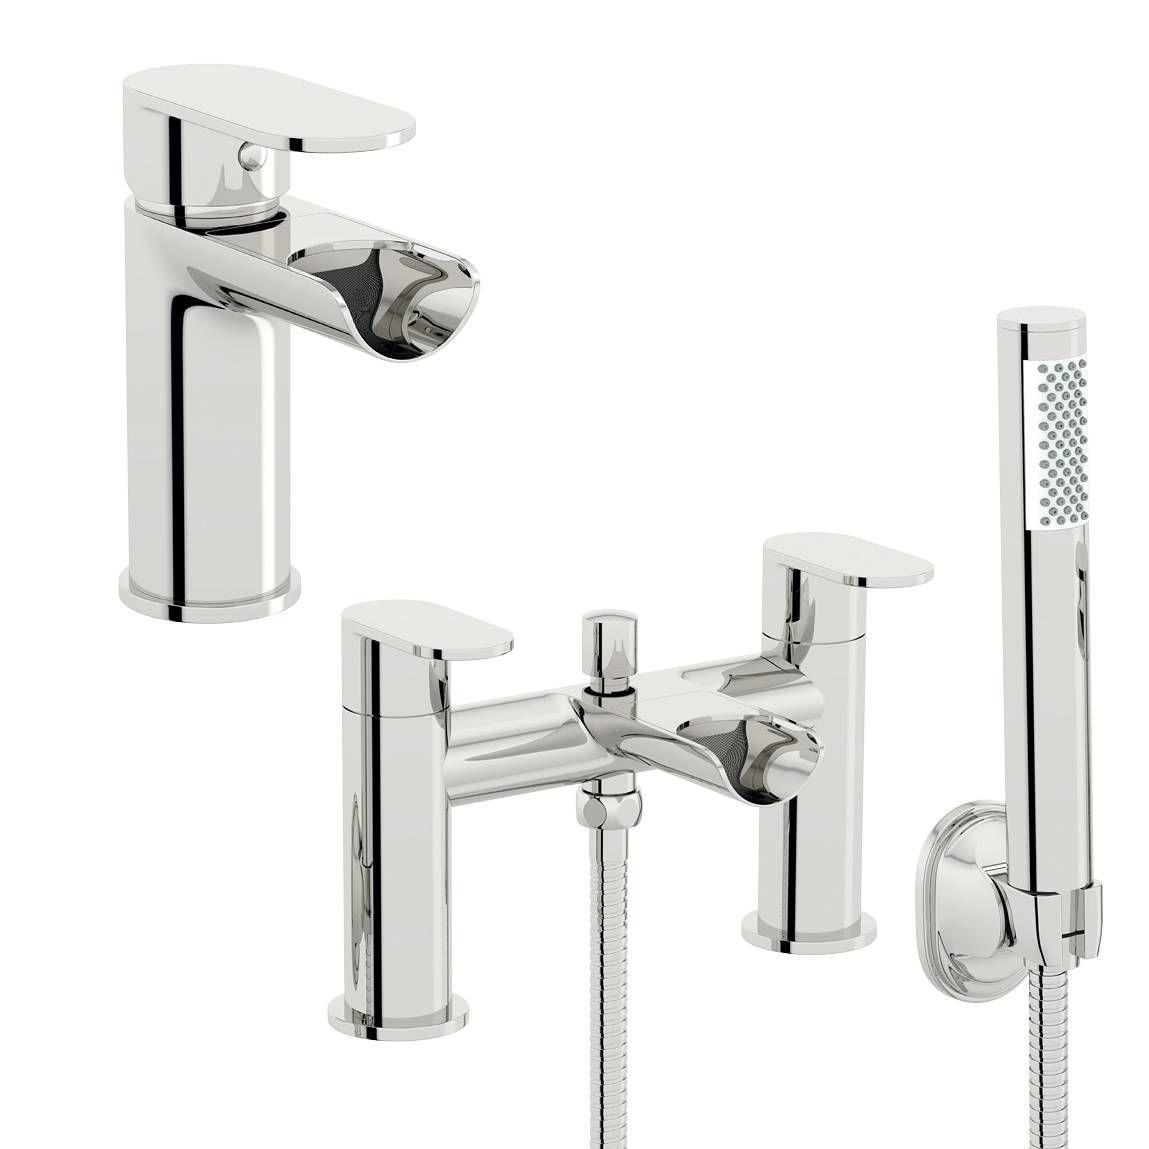 Keswick Basin And Bath Shower Mixer Pack Victoria Plumb Bath Shower Mixer Taps Shower Mixer Taps Bath Shower Mixer